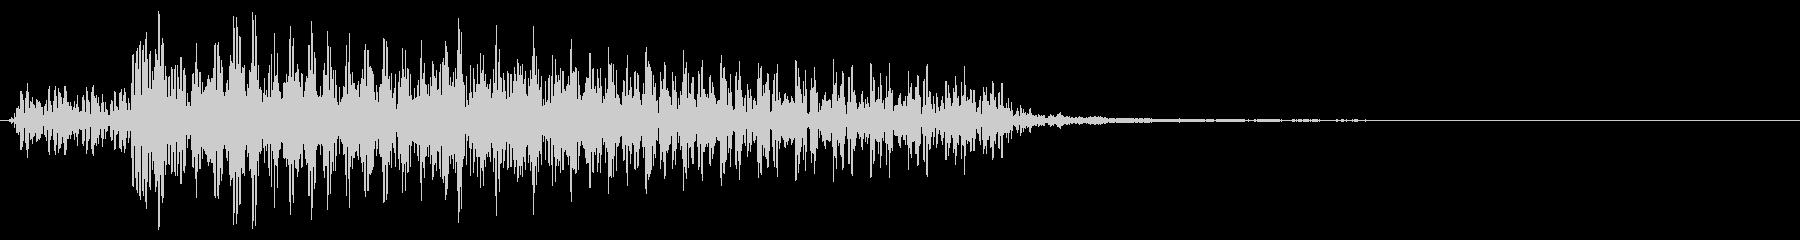 Bright stroke nylon guitar's unreproduced waveform